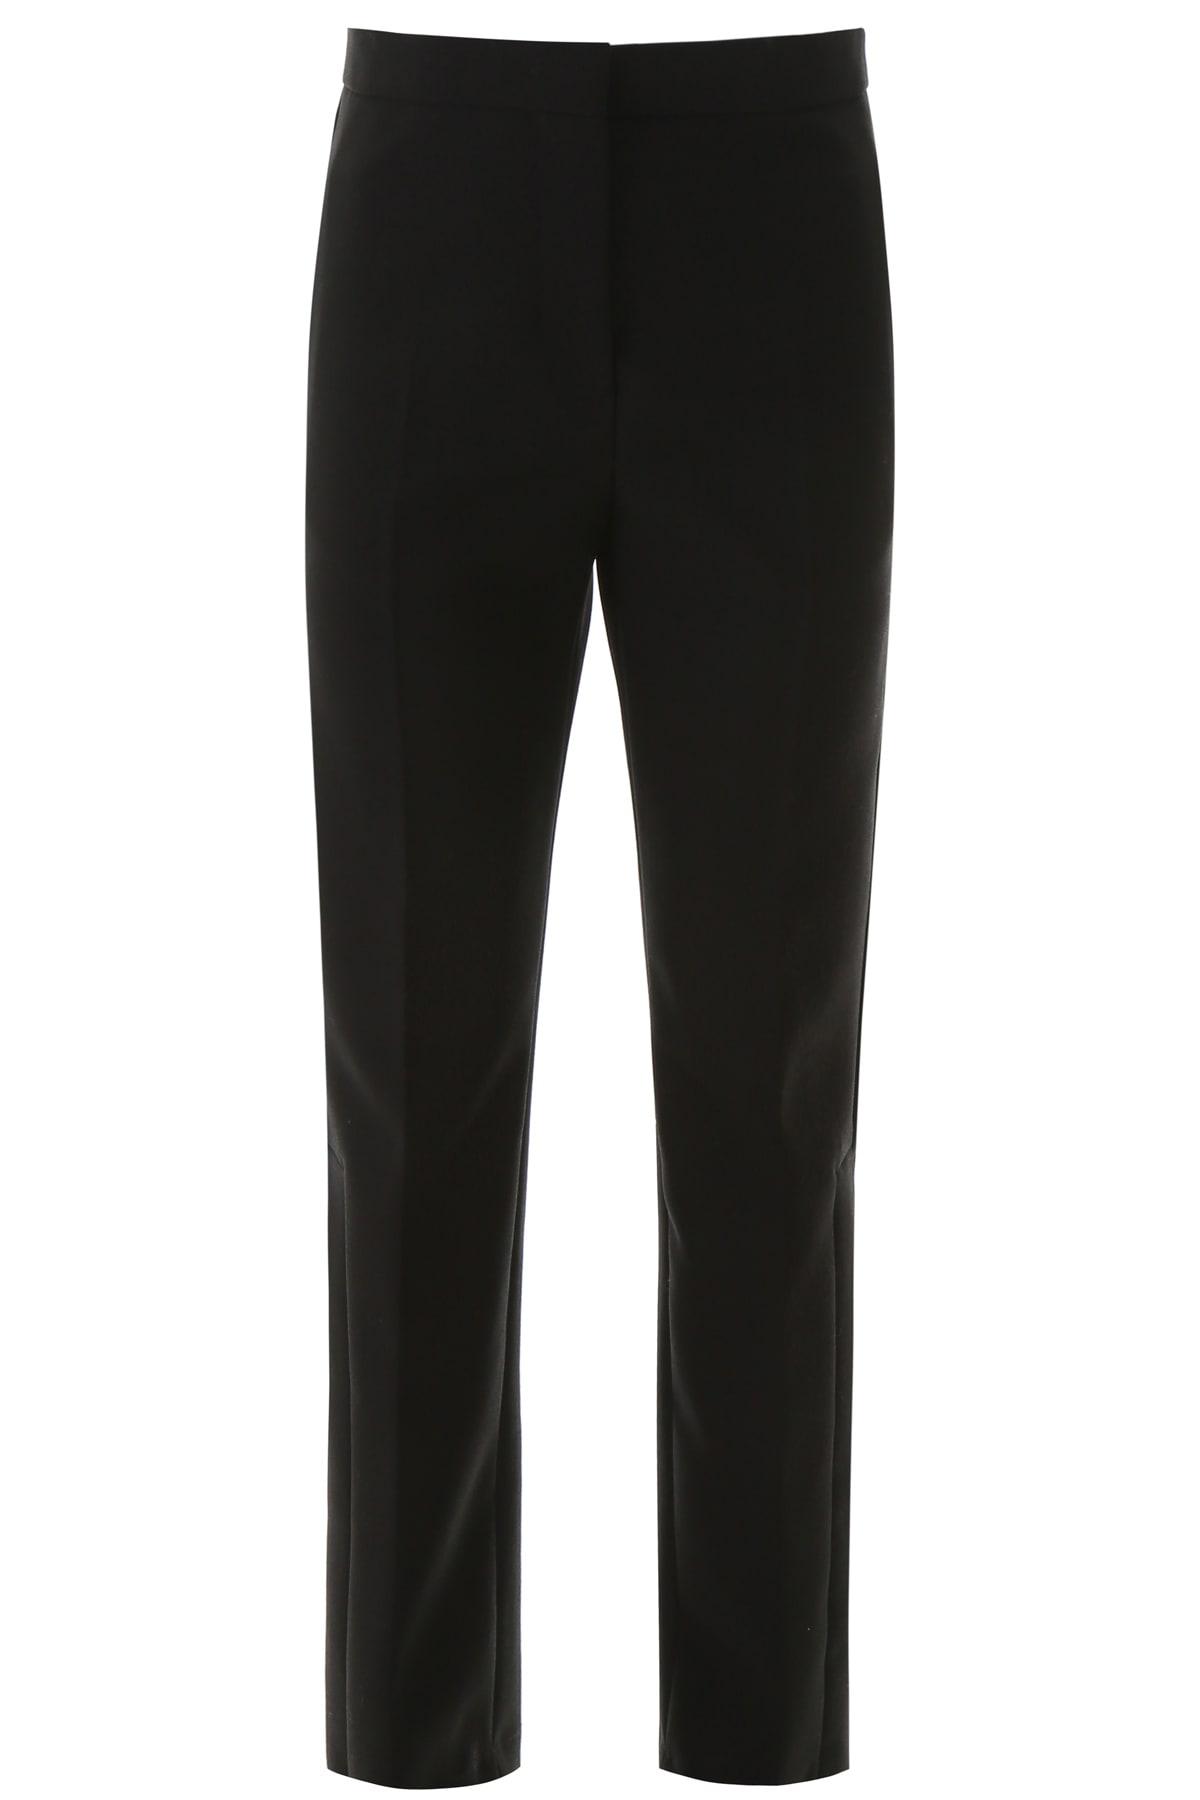 Jil Sander Stretch Wool Trousers